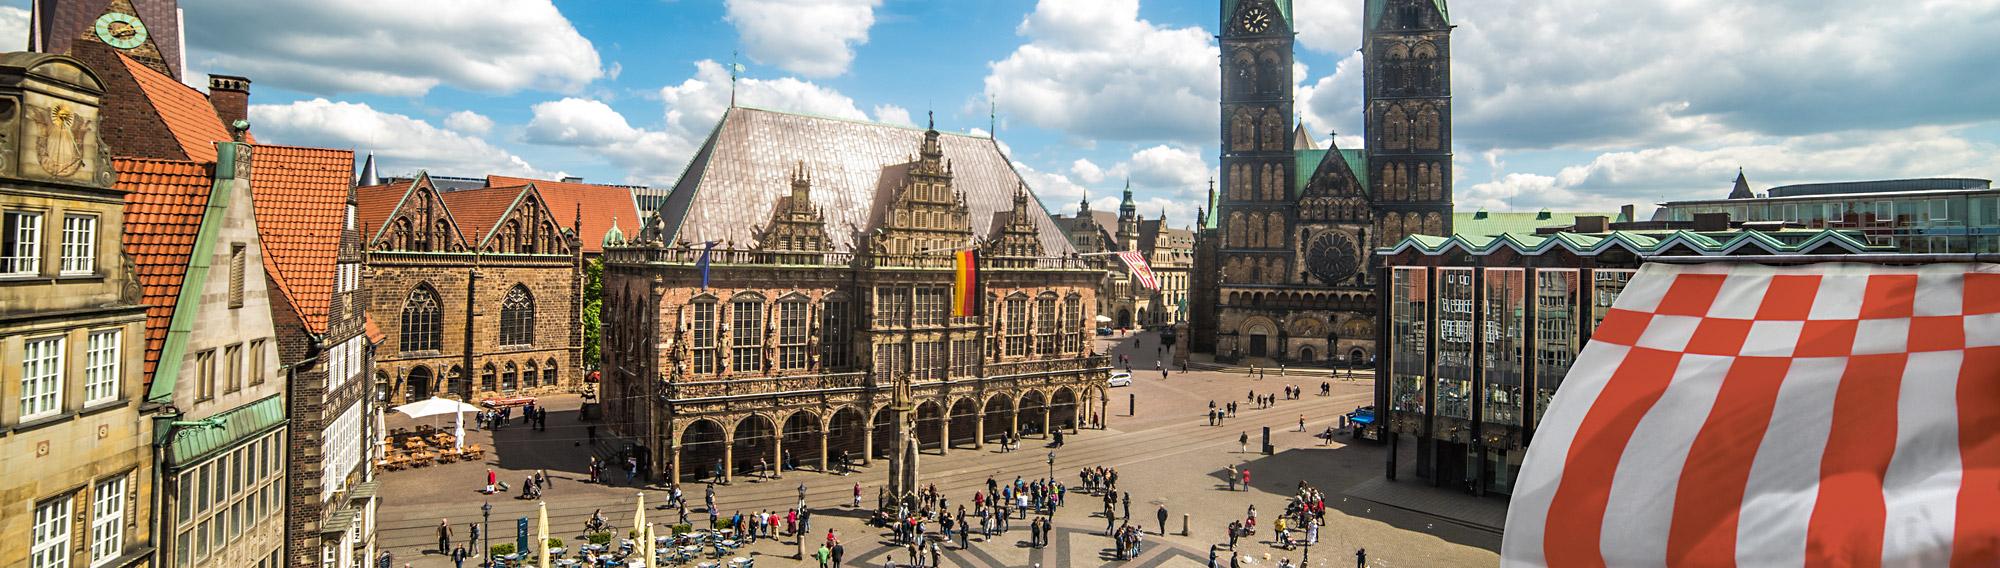 Bremer Marktplatz, Foto: WFB/Jonas Ginter